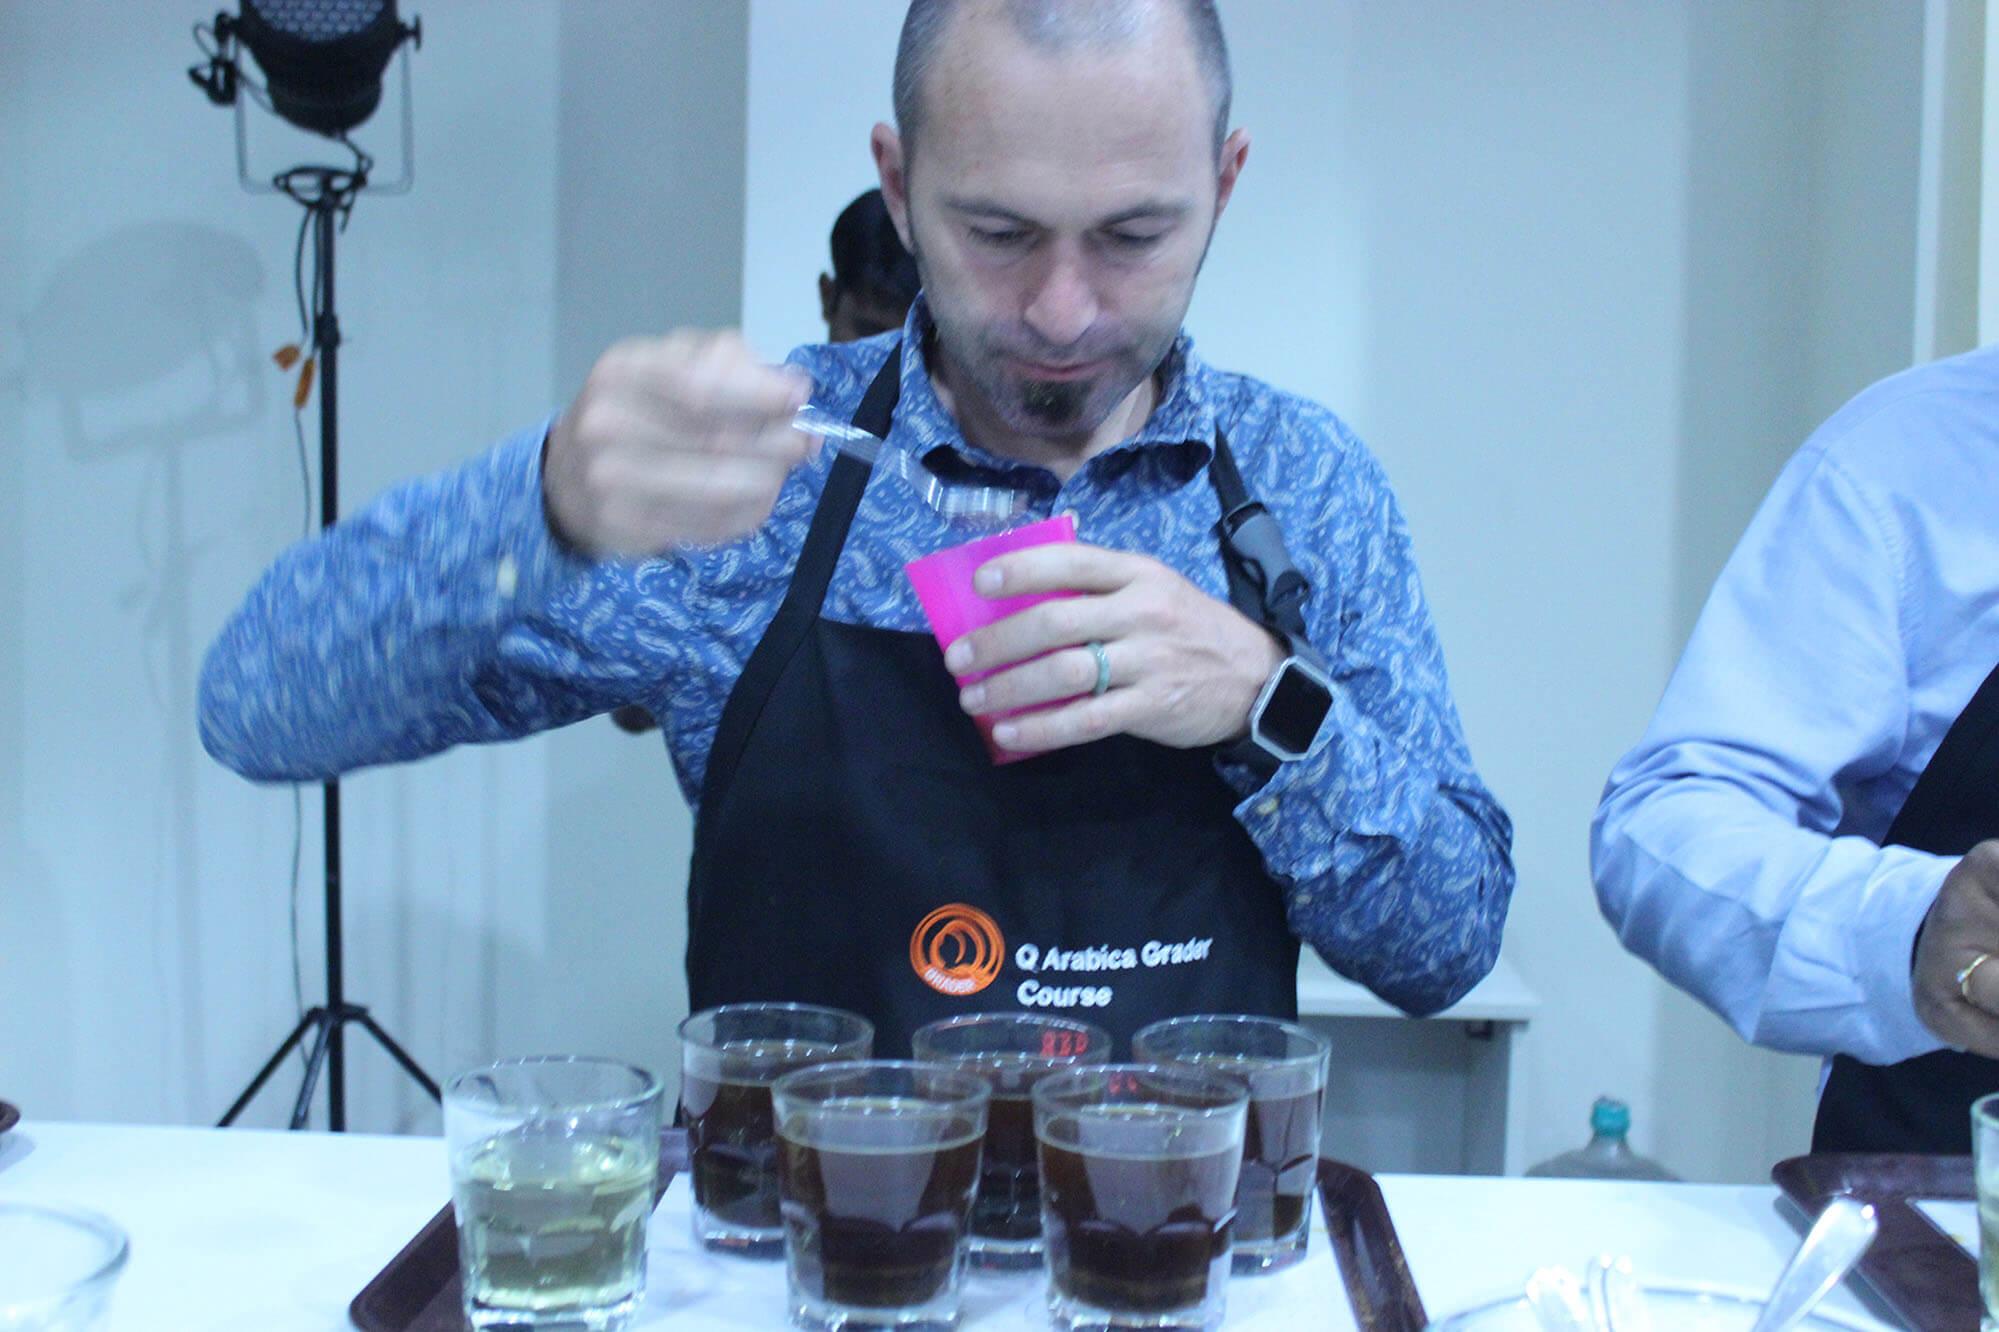 Red Sirocco Coffee Q Grader Arabica Coffee Training 12